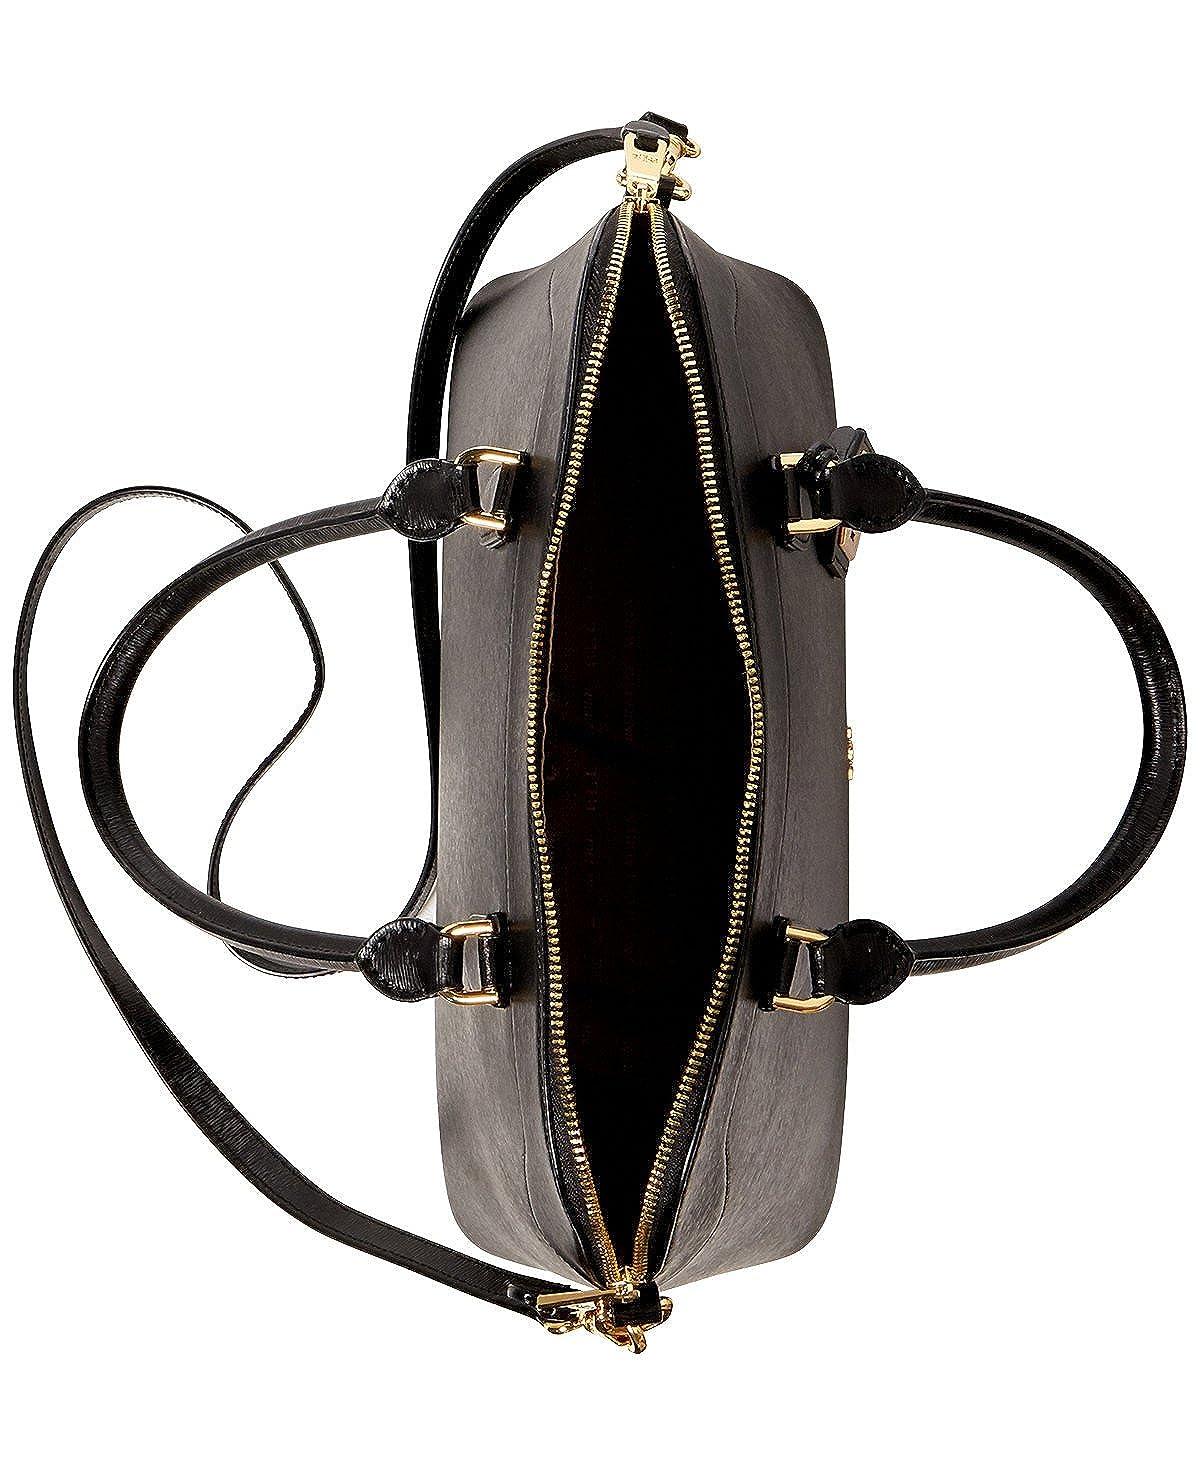 121ac3162f3e Lauren Ralph Lauren Nora Medium Satchel (Tan)  Amazon.ca  Shoes   Handbags